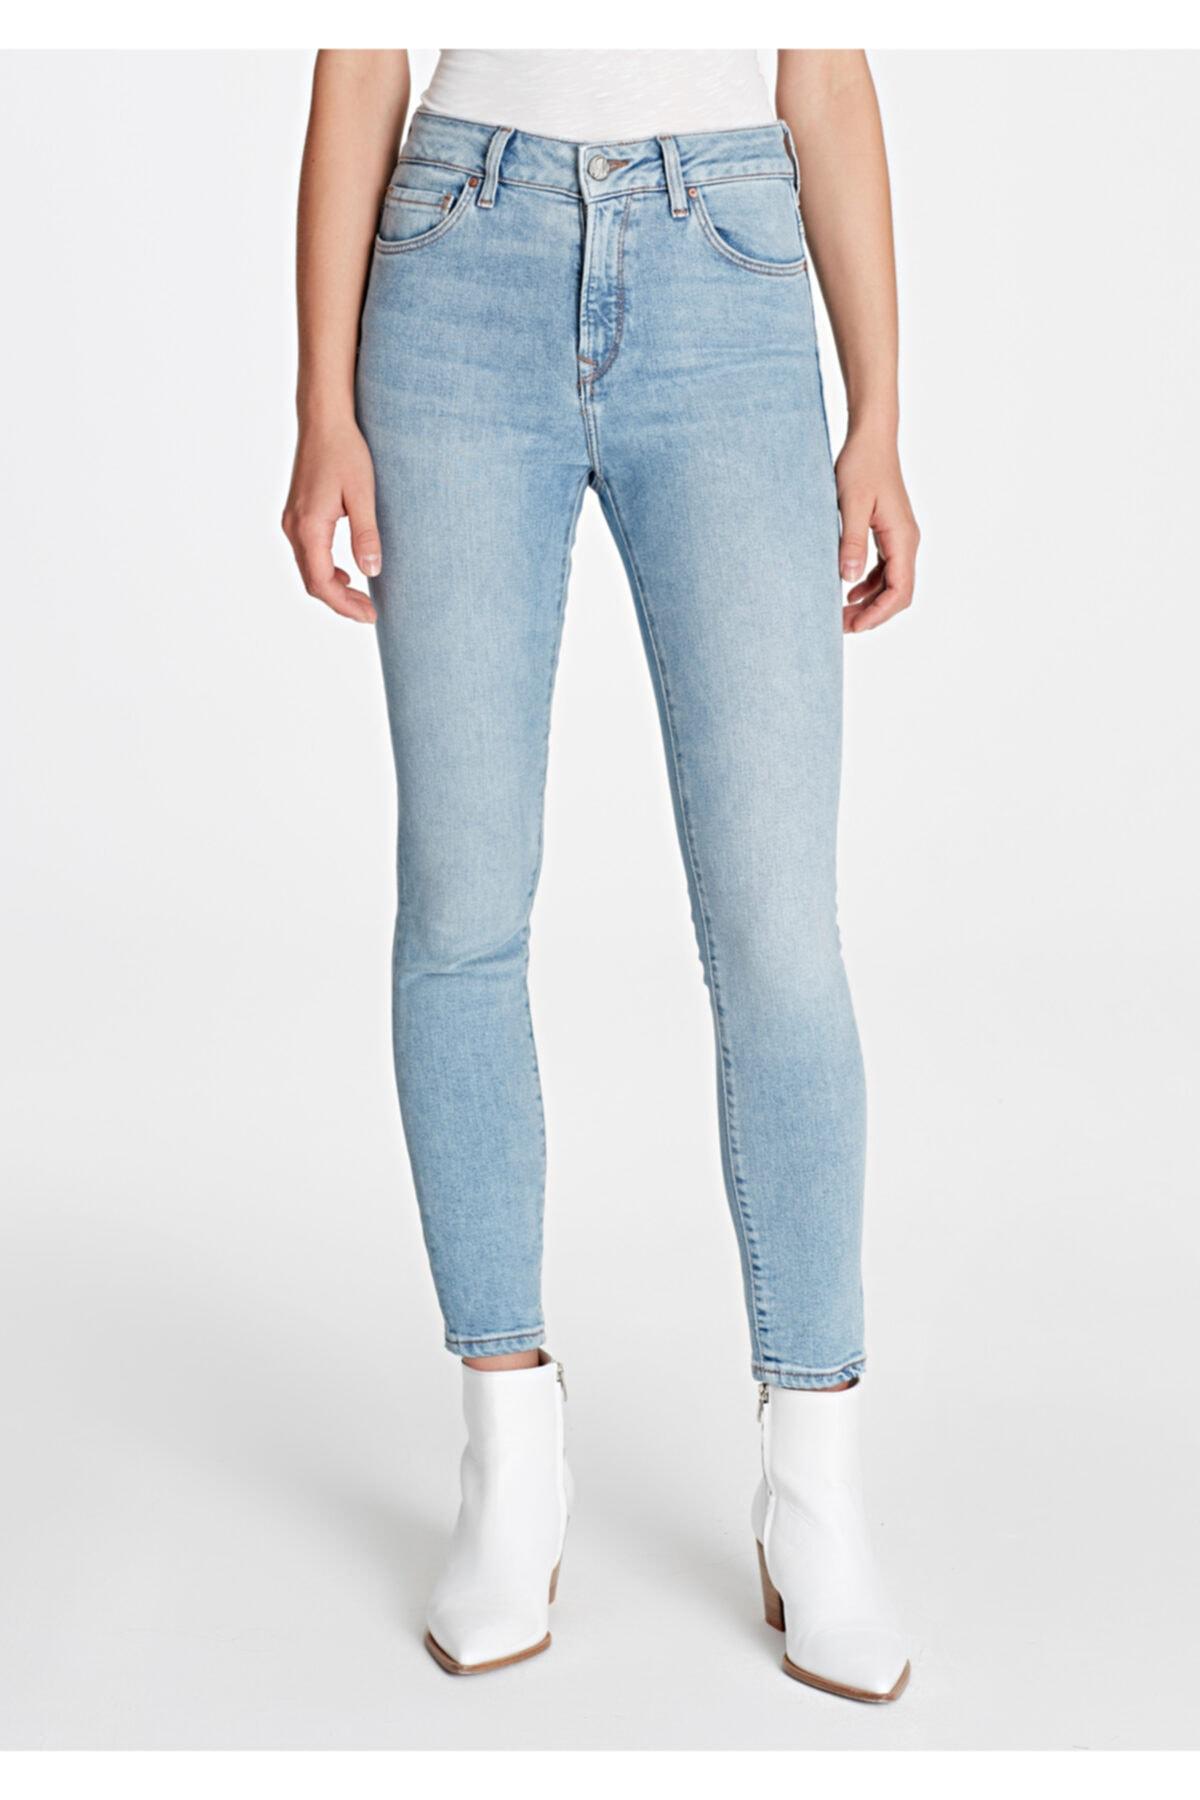 Mavi Kadın Mavi Tess Vintage Jean 100328-22253 2